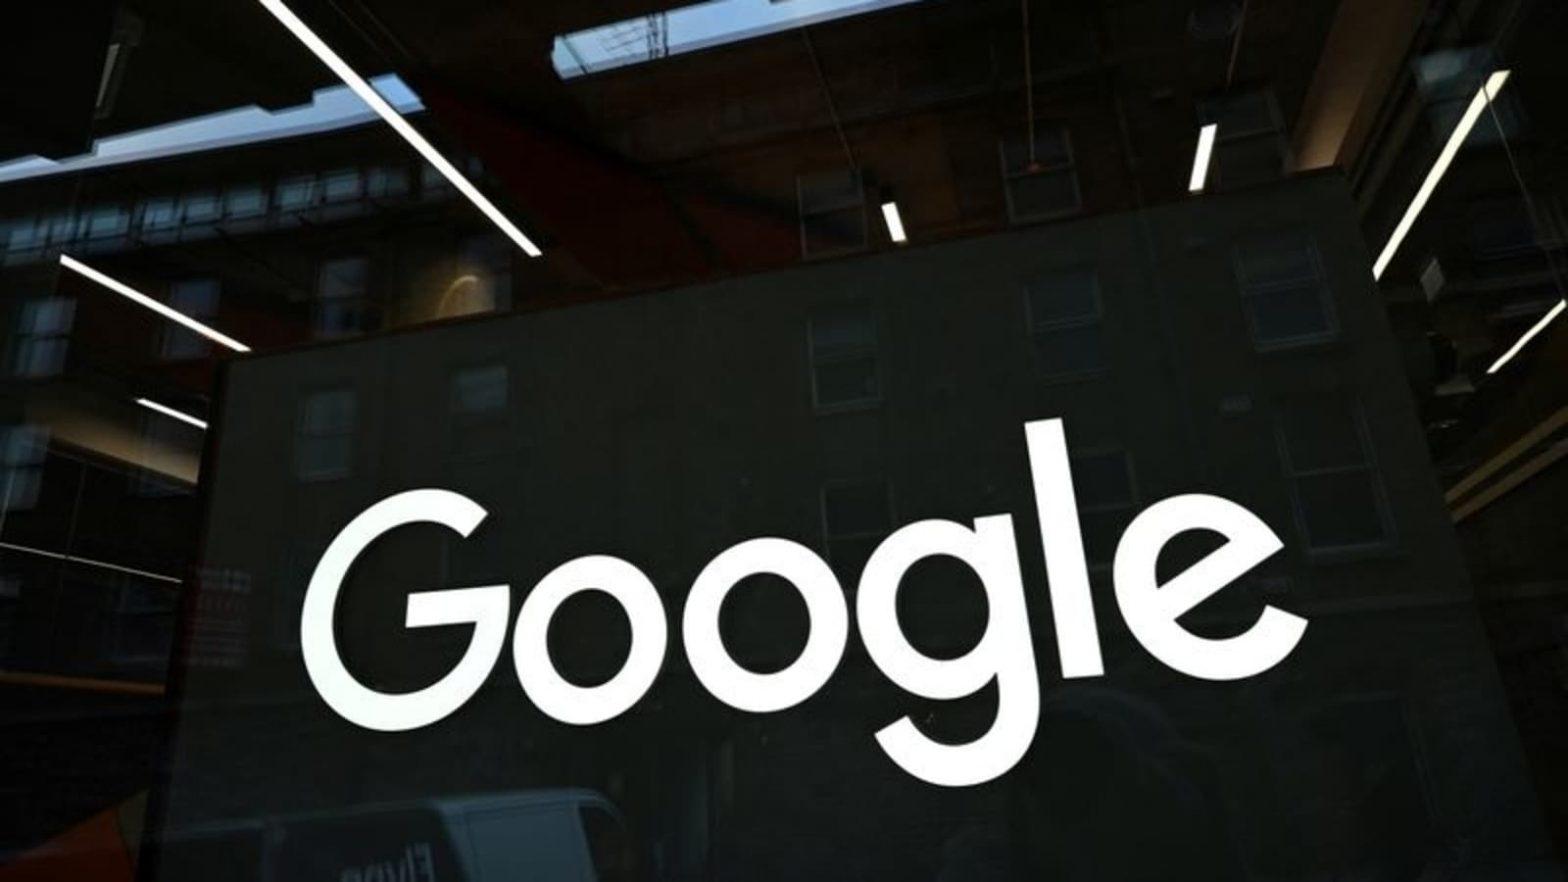 Google floats News Showcase in India with top publishers | മികച്ച പ്രസാധകരുമായി ഗൂഗിൾ ഇന്ത്യയിലെ ന്യൂസ് ഷോകേസ് ഫ്ലോട്ട് ചെയ്യുന്നു_40.1